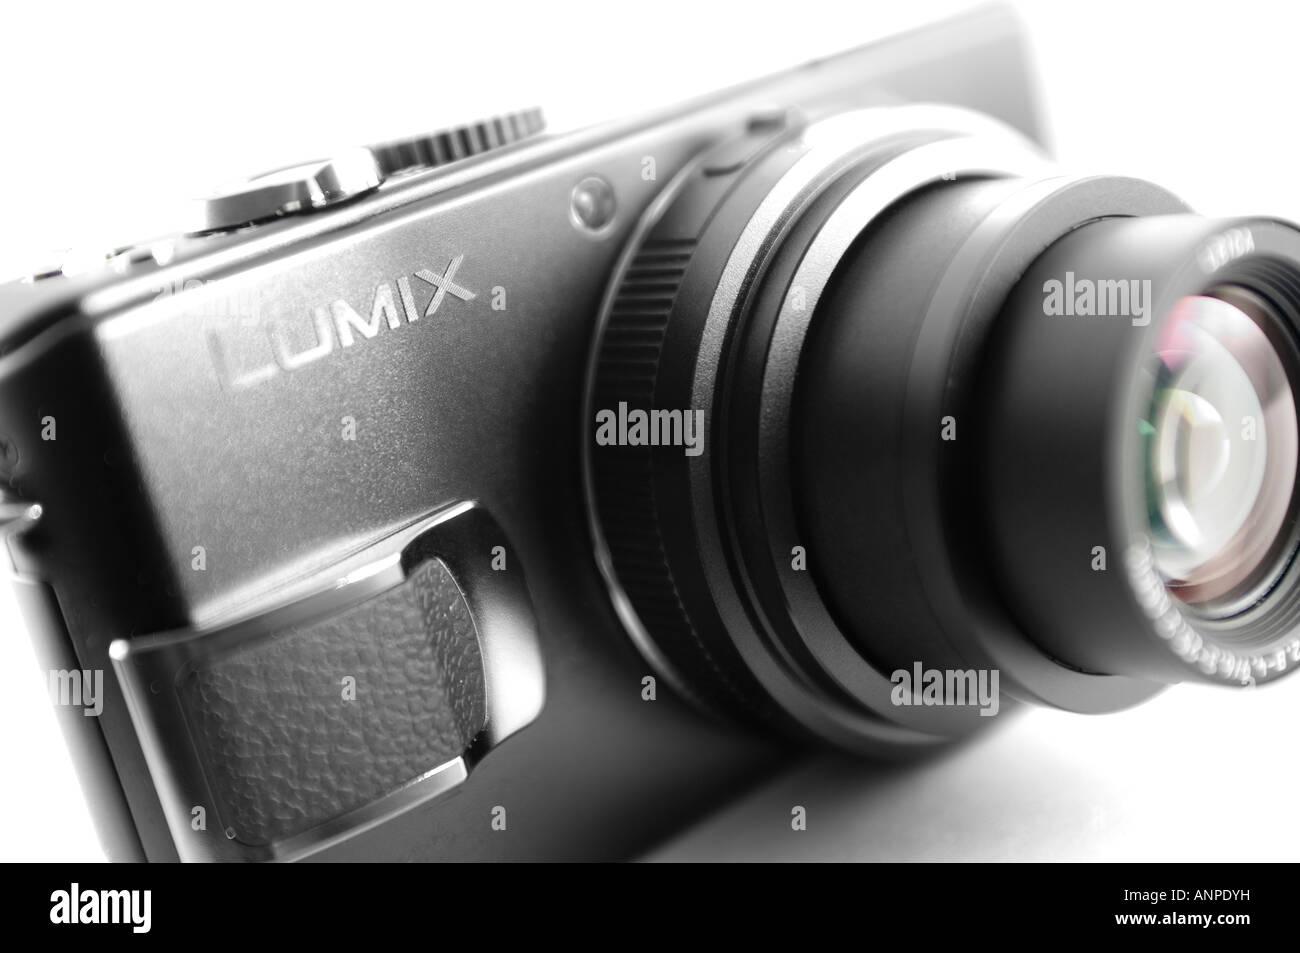 Lumix Camera  LX2 - Stock Image